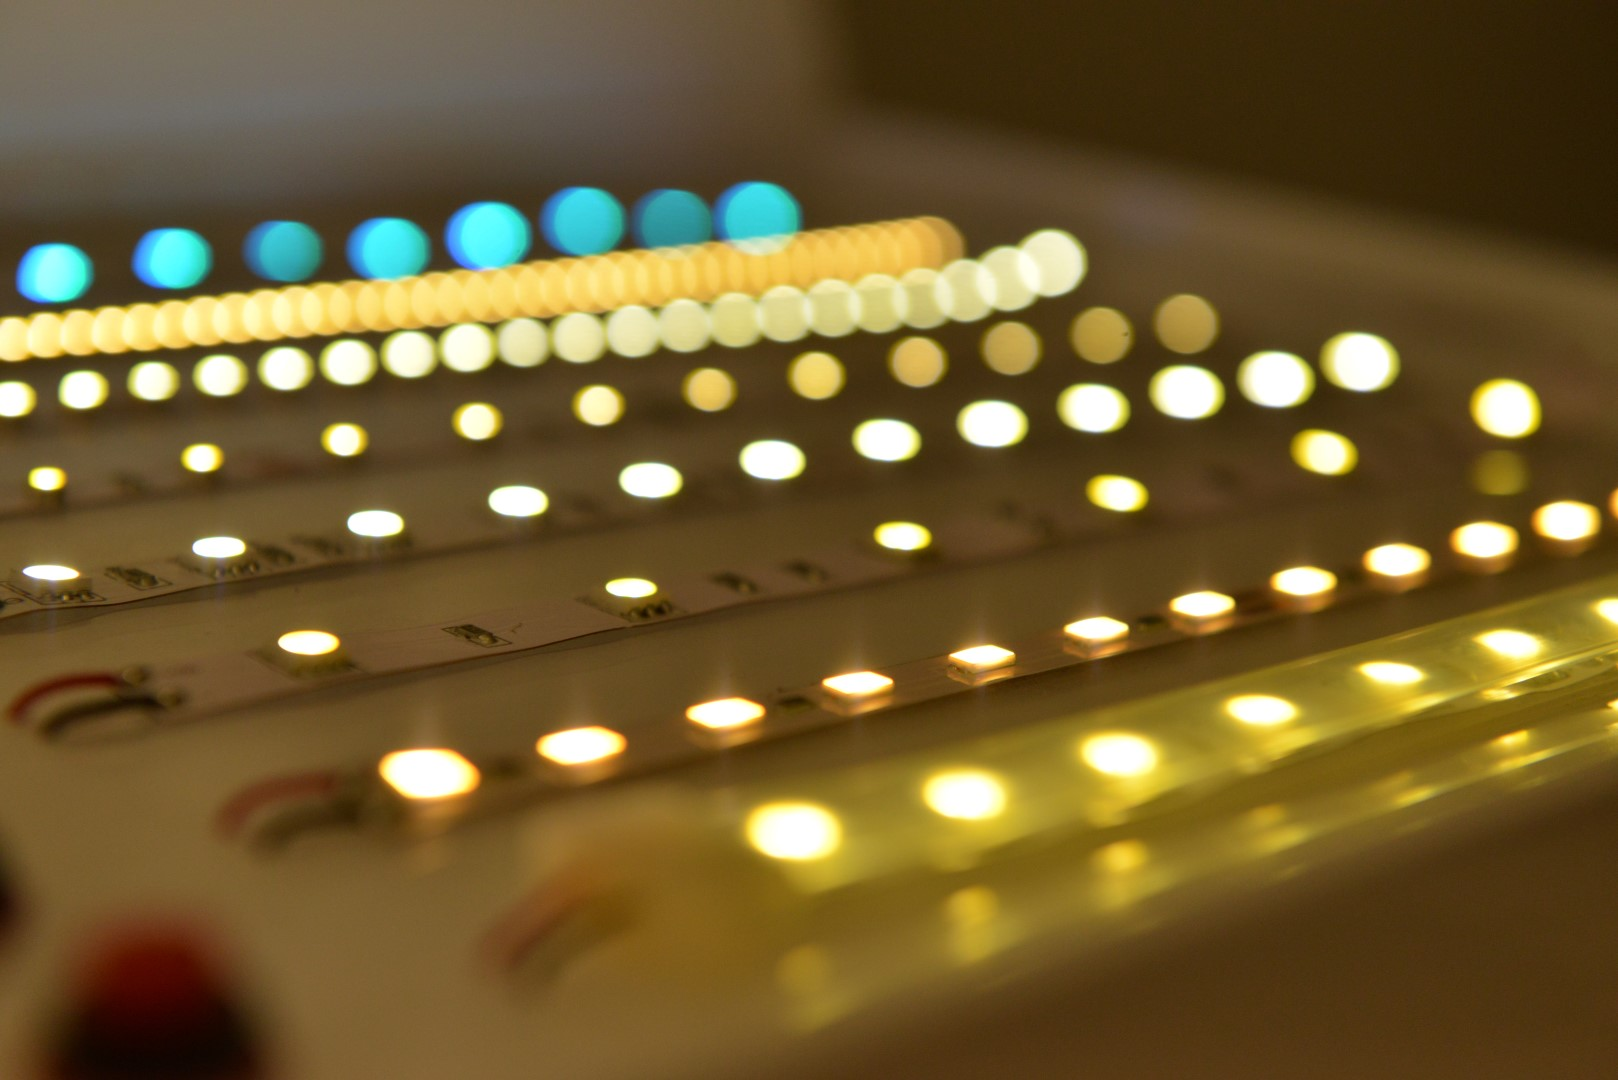 Induzione elettromagnetica alia energia - Strisce a led per interni ...